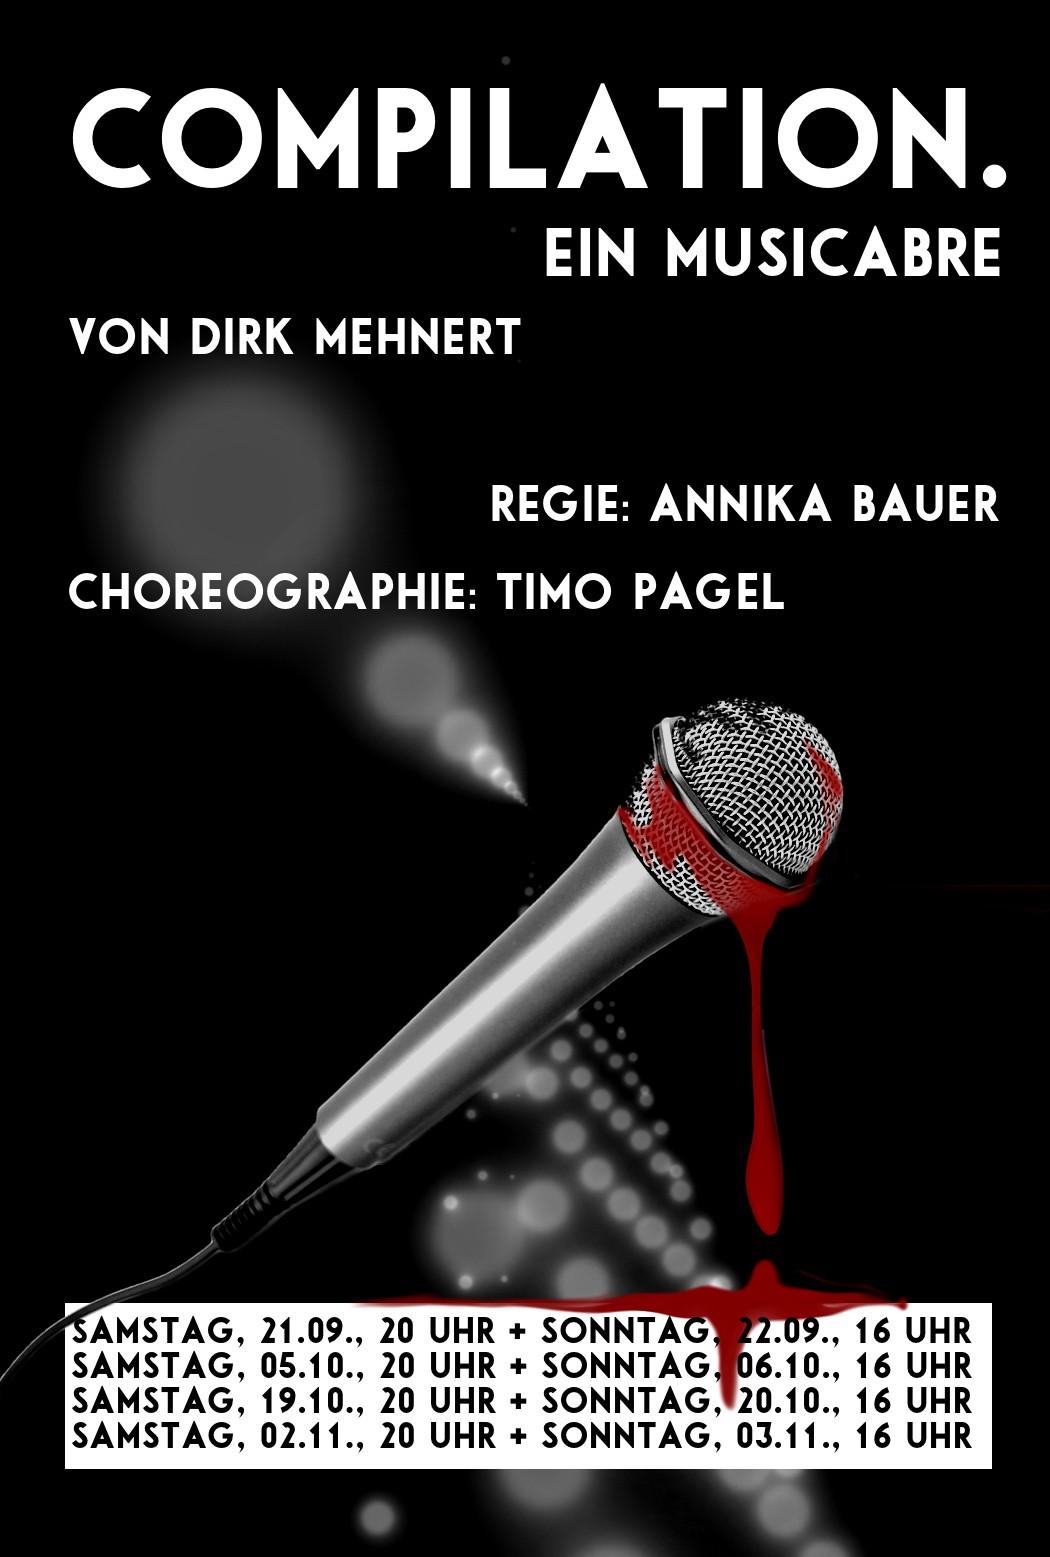 Compilation, das Musicabre